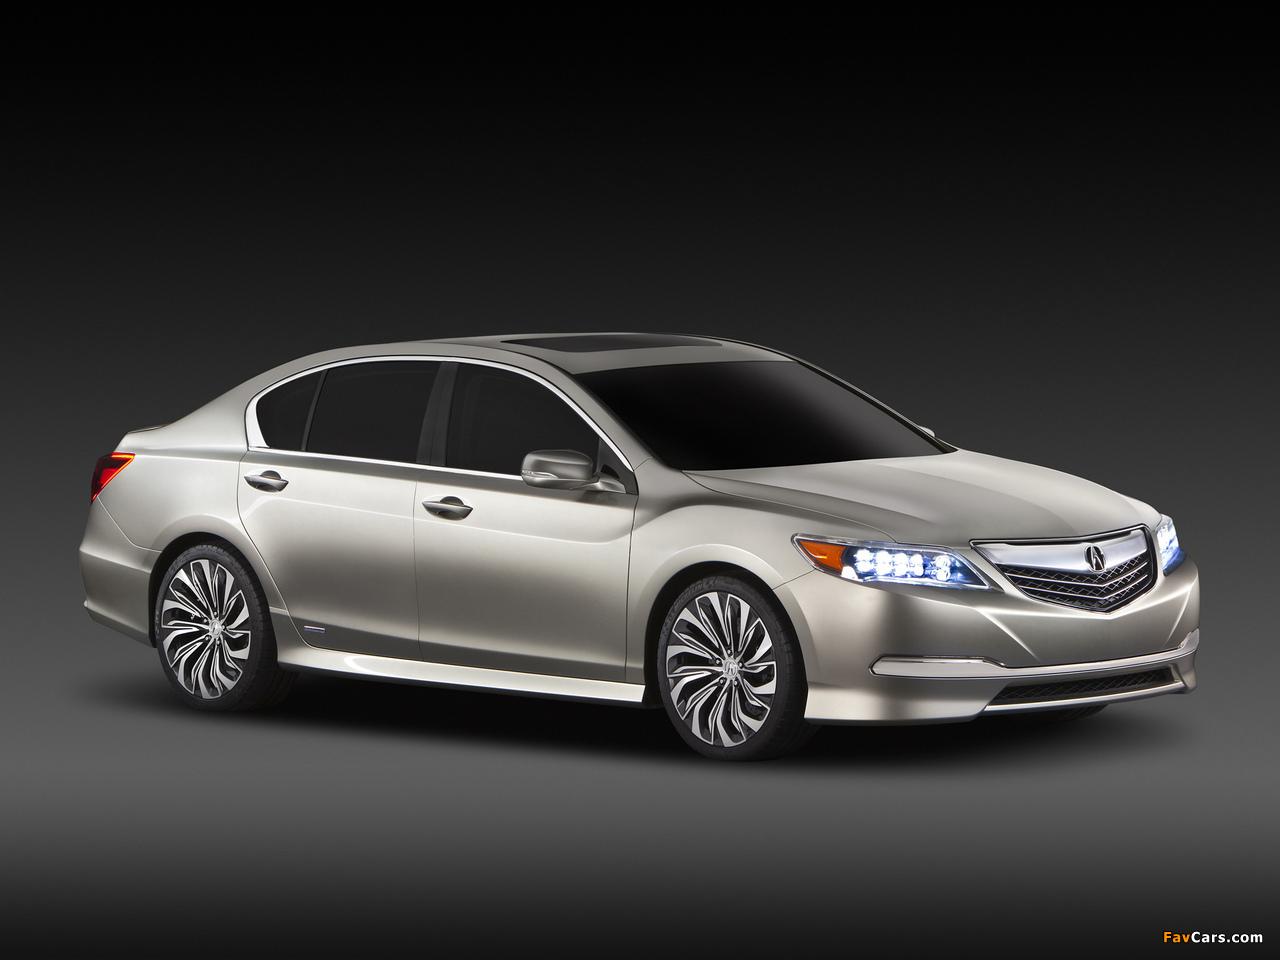 Acura RLX Concept (2012) images (1280 x 960)